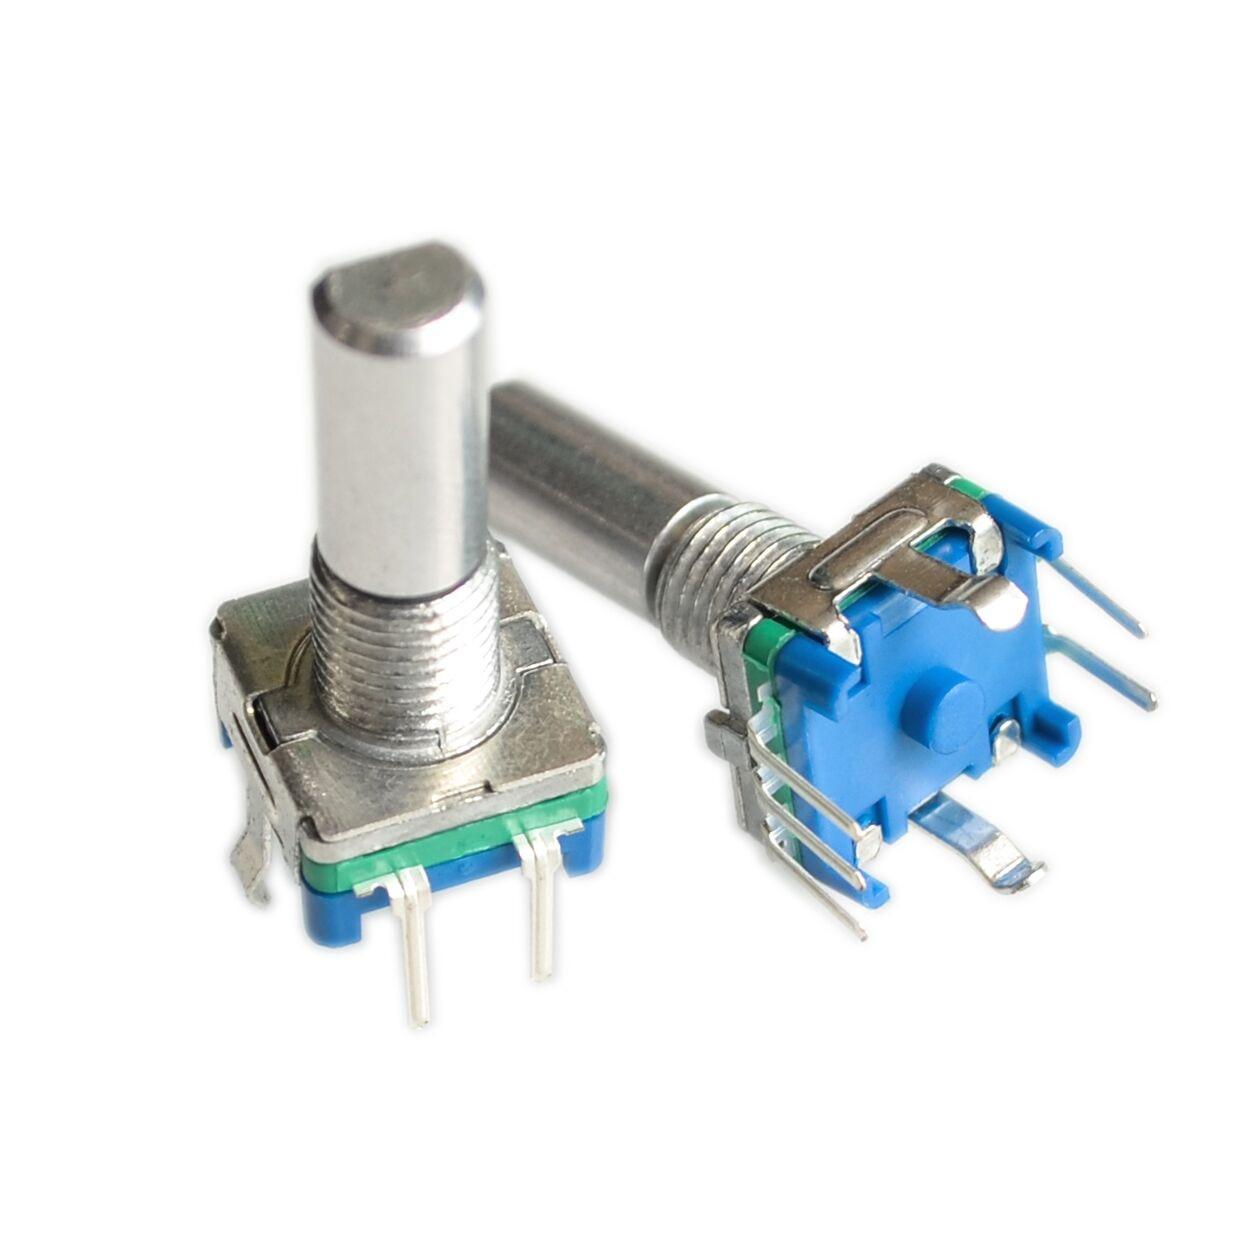 20 pçs/lote original, codificador rotativo, interruptor de código/ec11/potenciômetro digital de áudio, com interruptor, 5pin, comprimento do punho 20mm